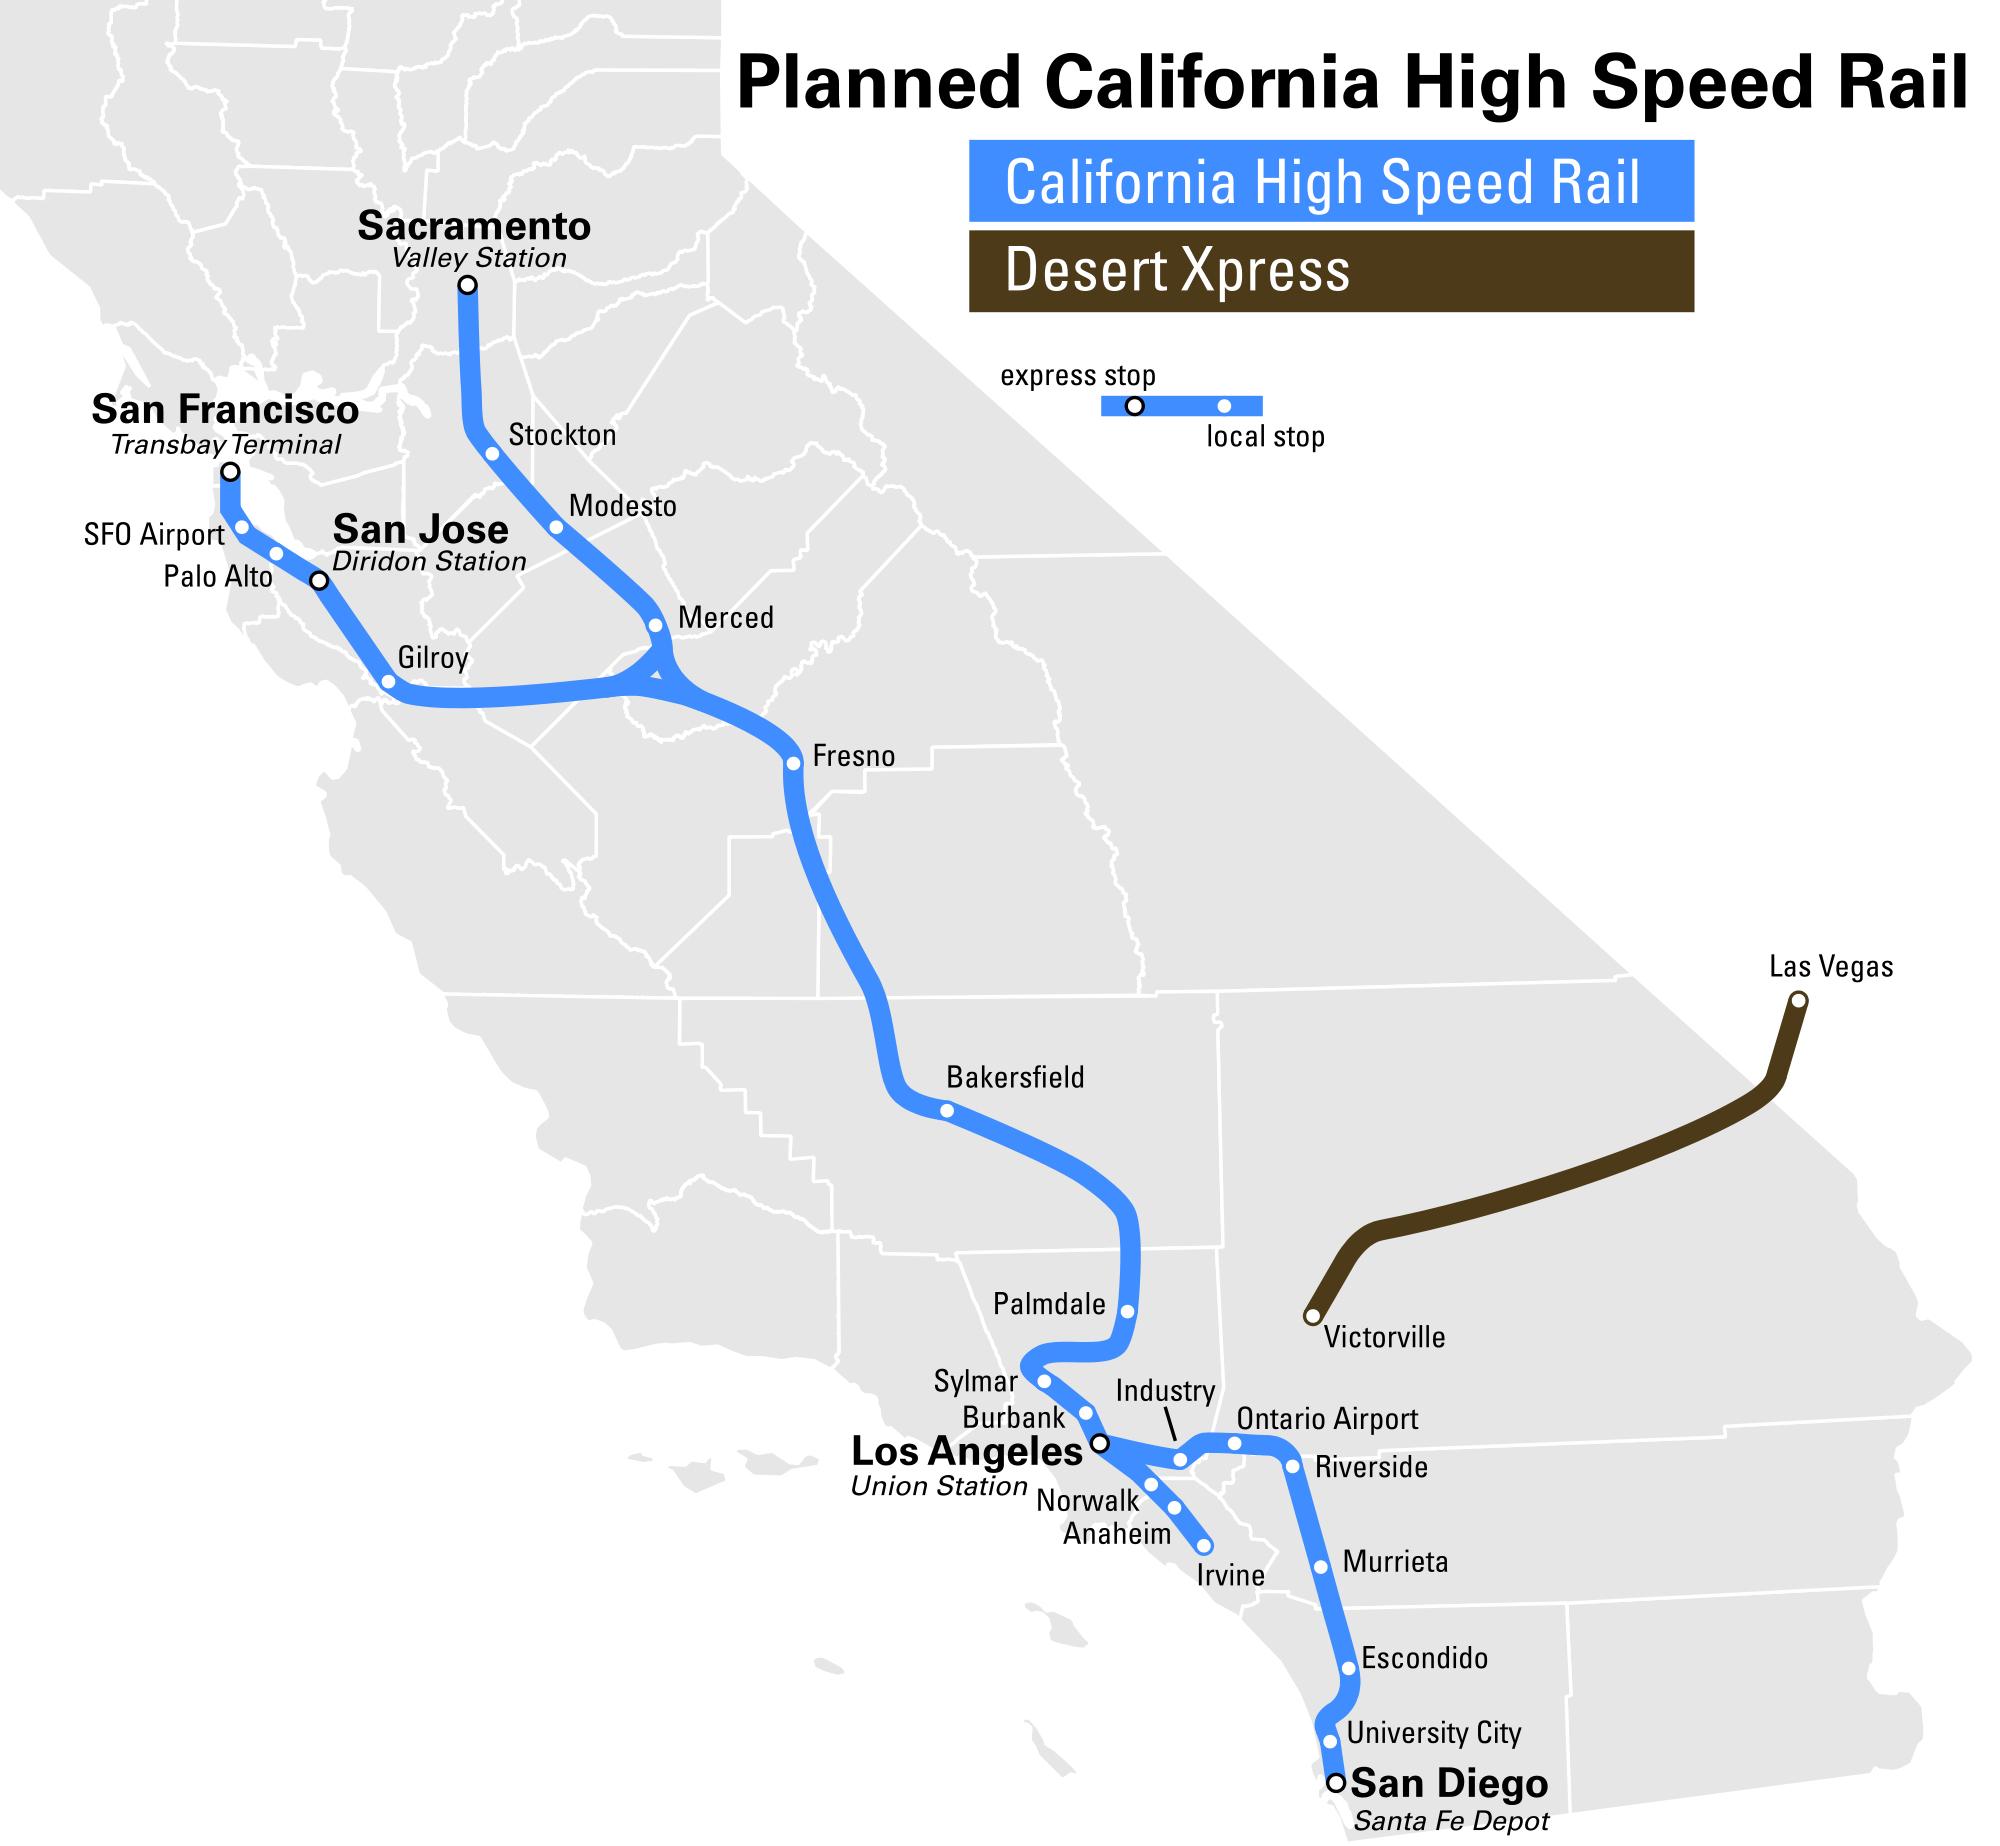 Amtrak Station Map California California River Map Amtrak Stations - Amtrak Station Map California